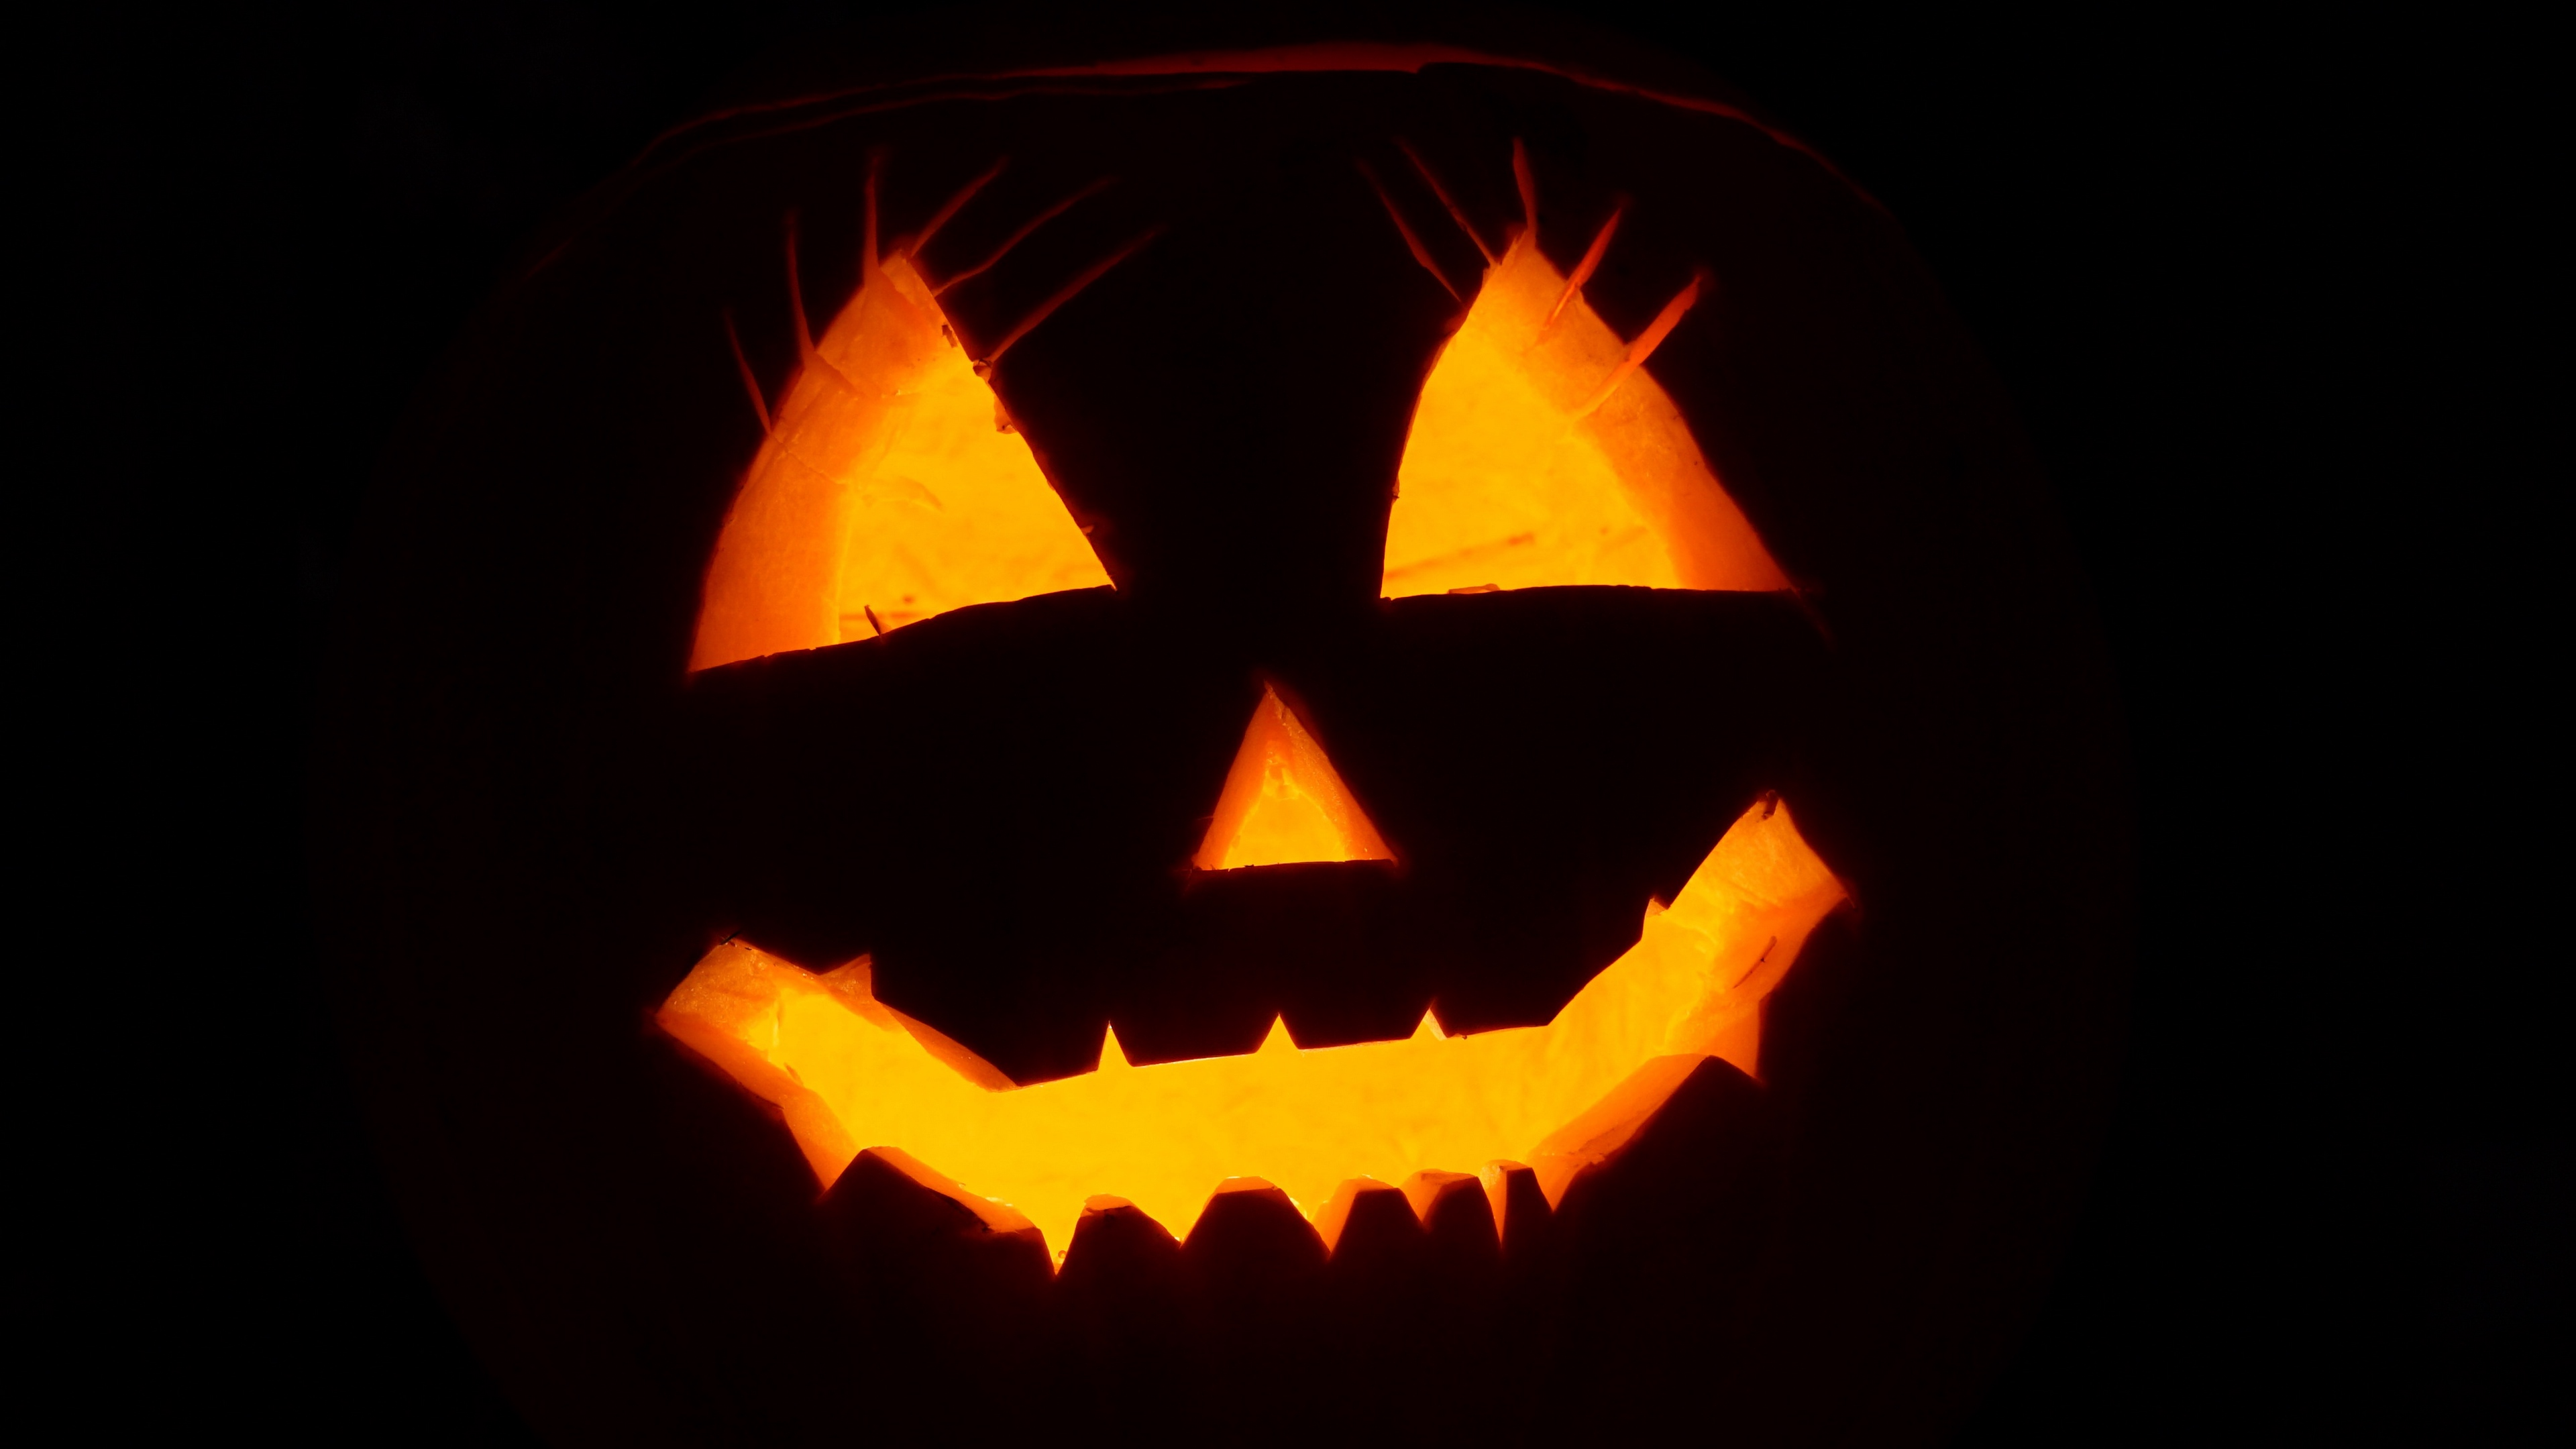 halloween face black background 4k 1538344911 - halloween, face, black background 4k - halloween, Face, black background